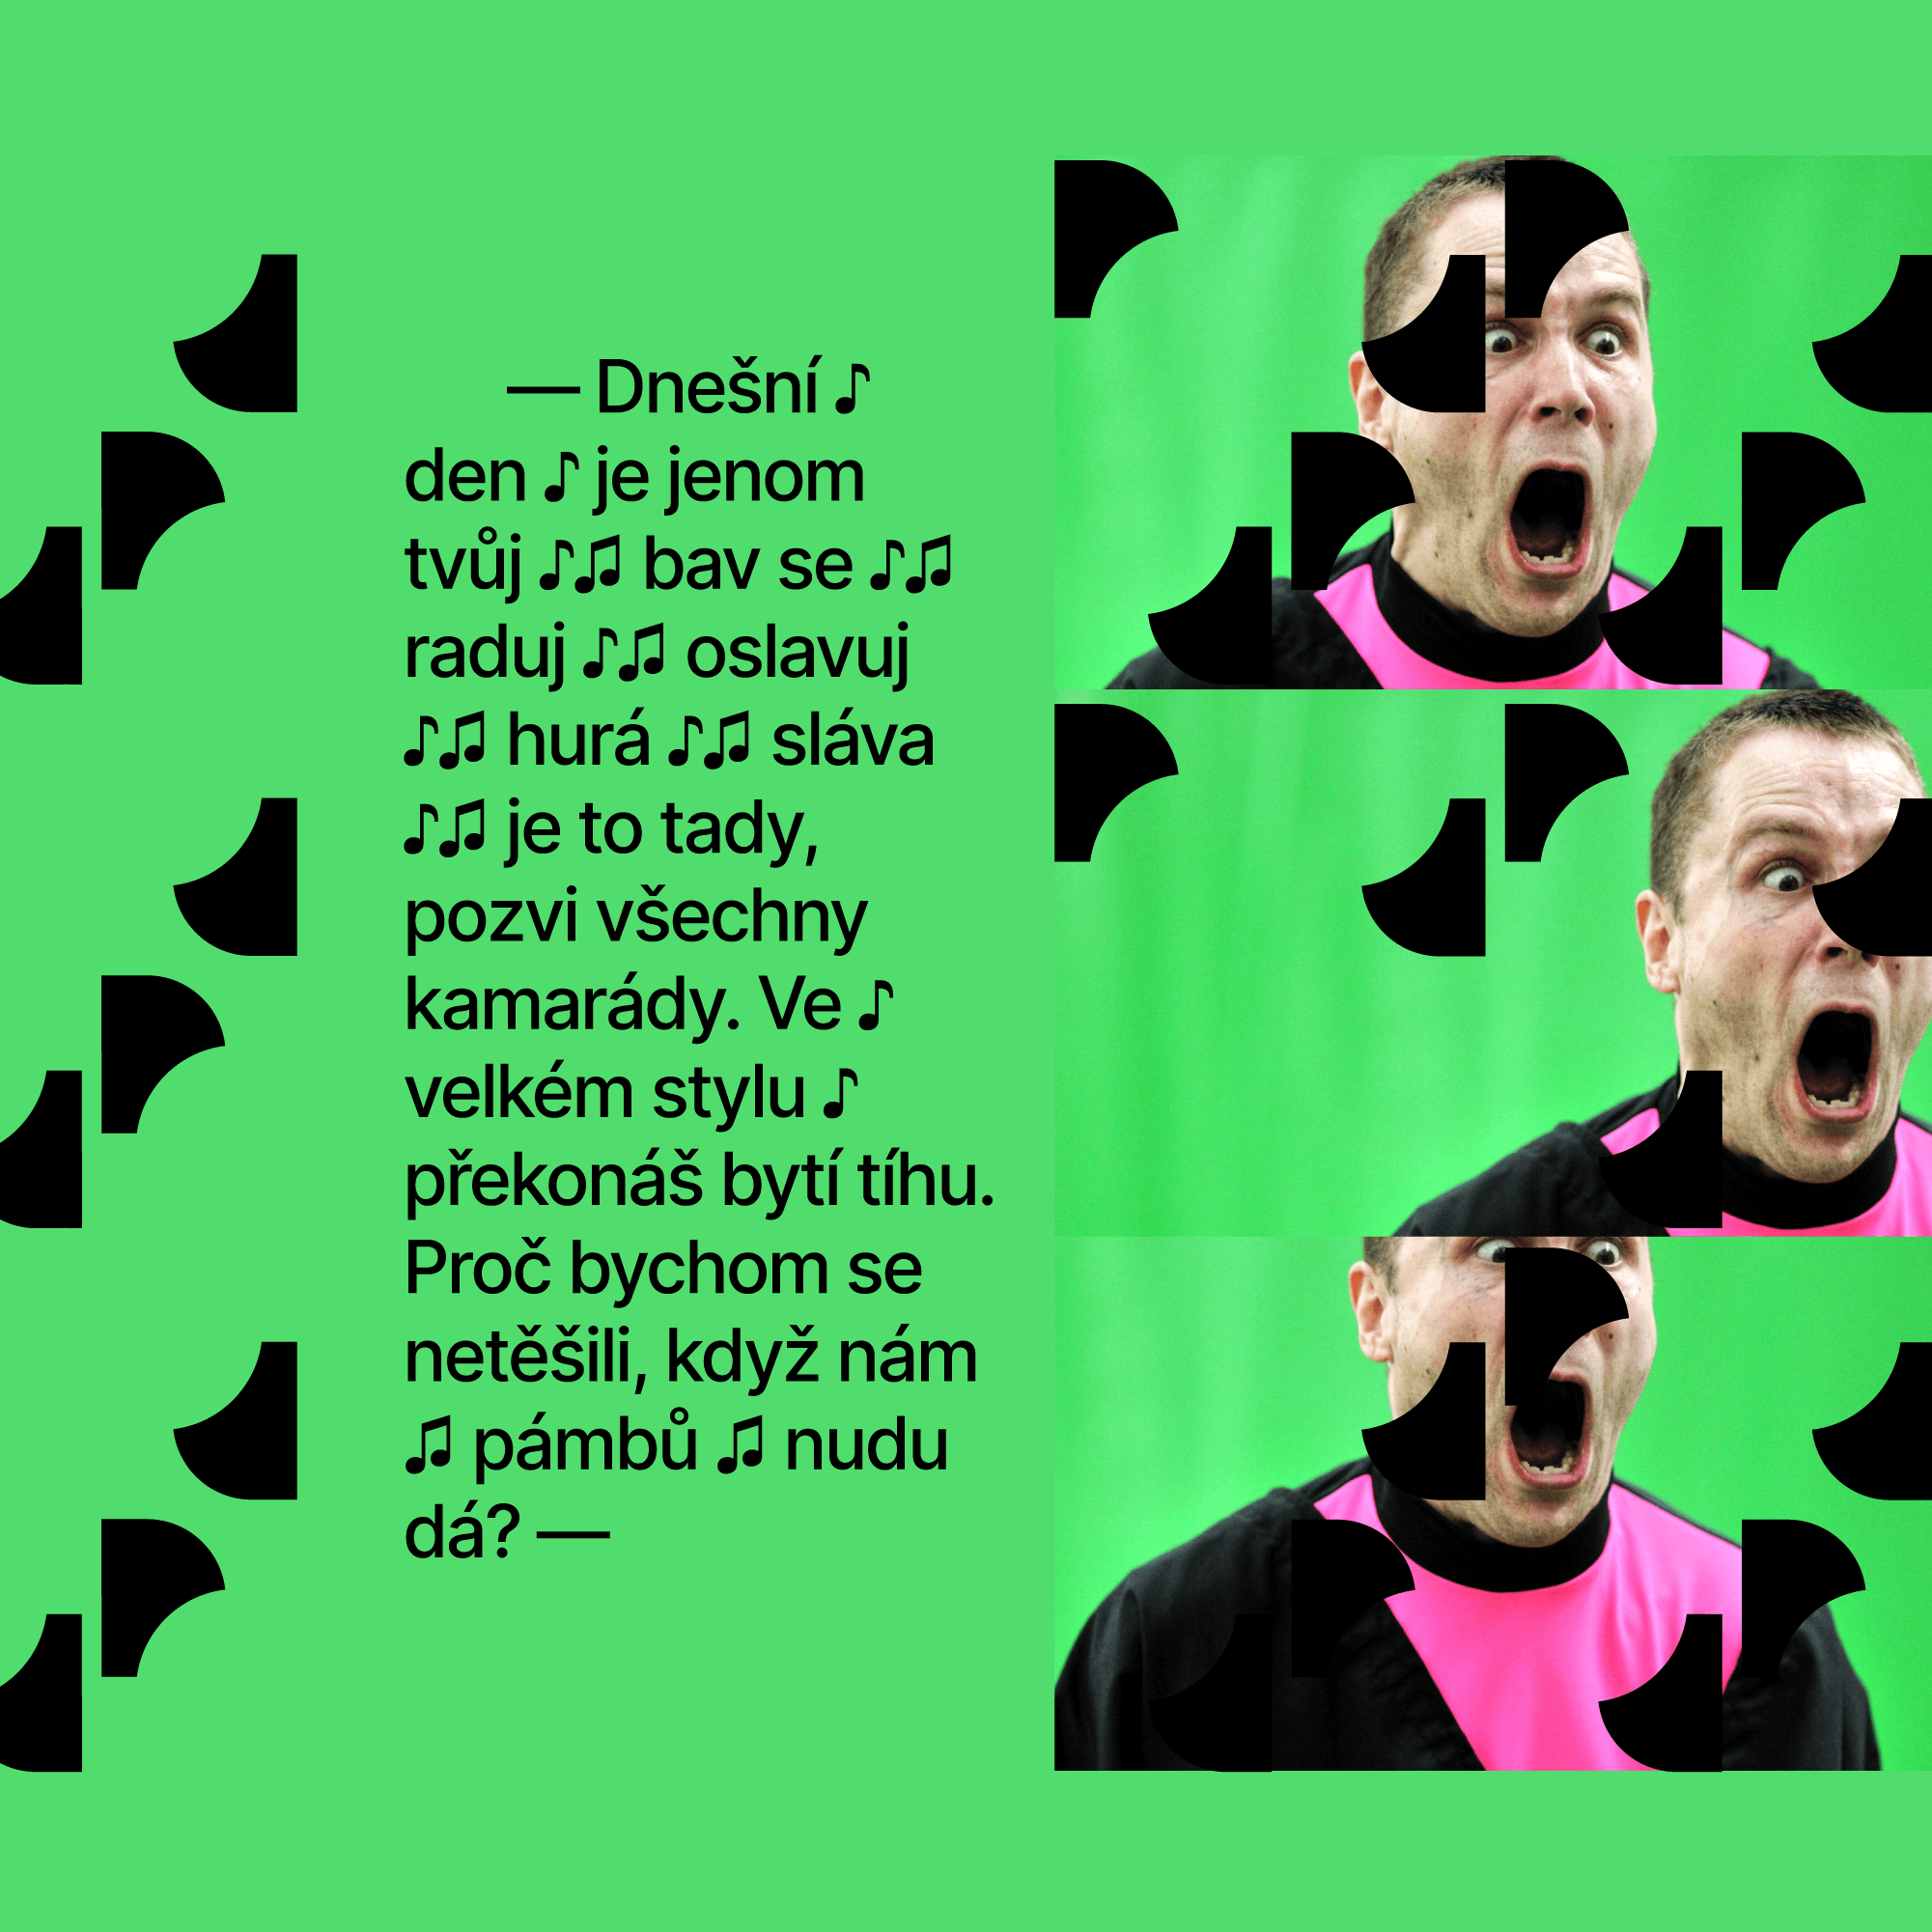 Drama-Queer-Social-v03_DQ-Artist-06-02